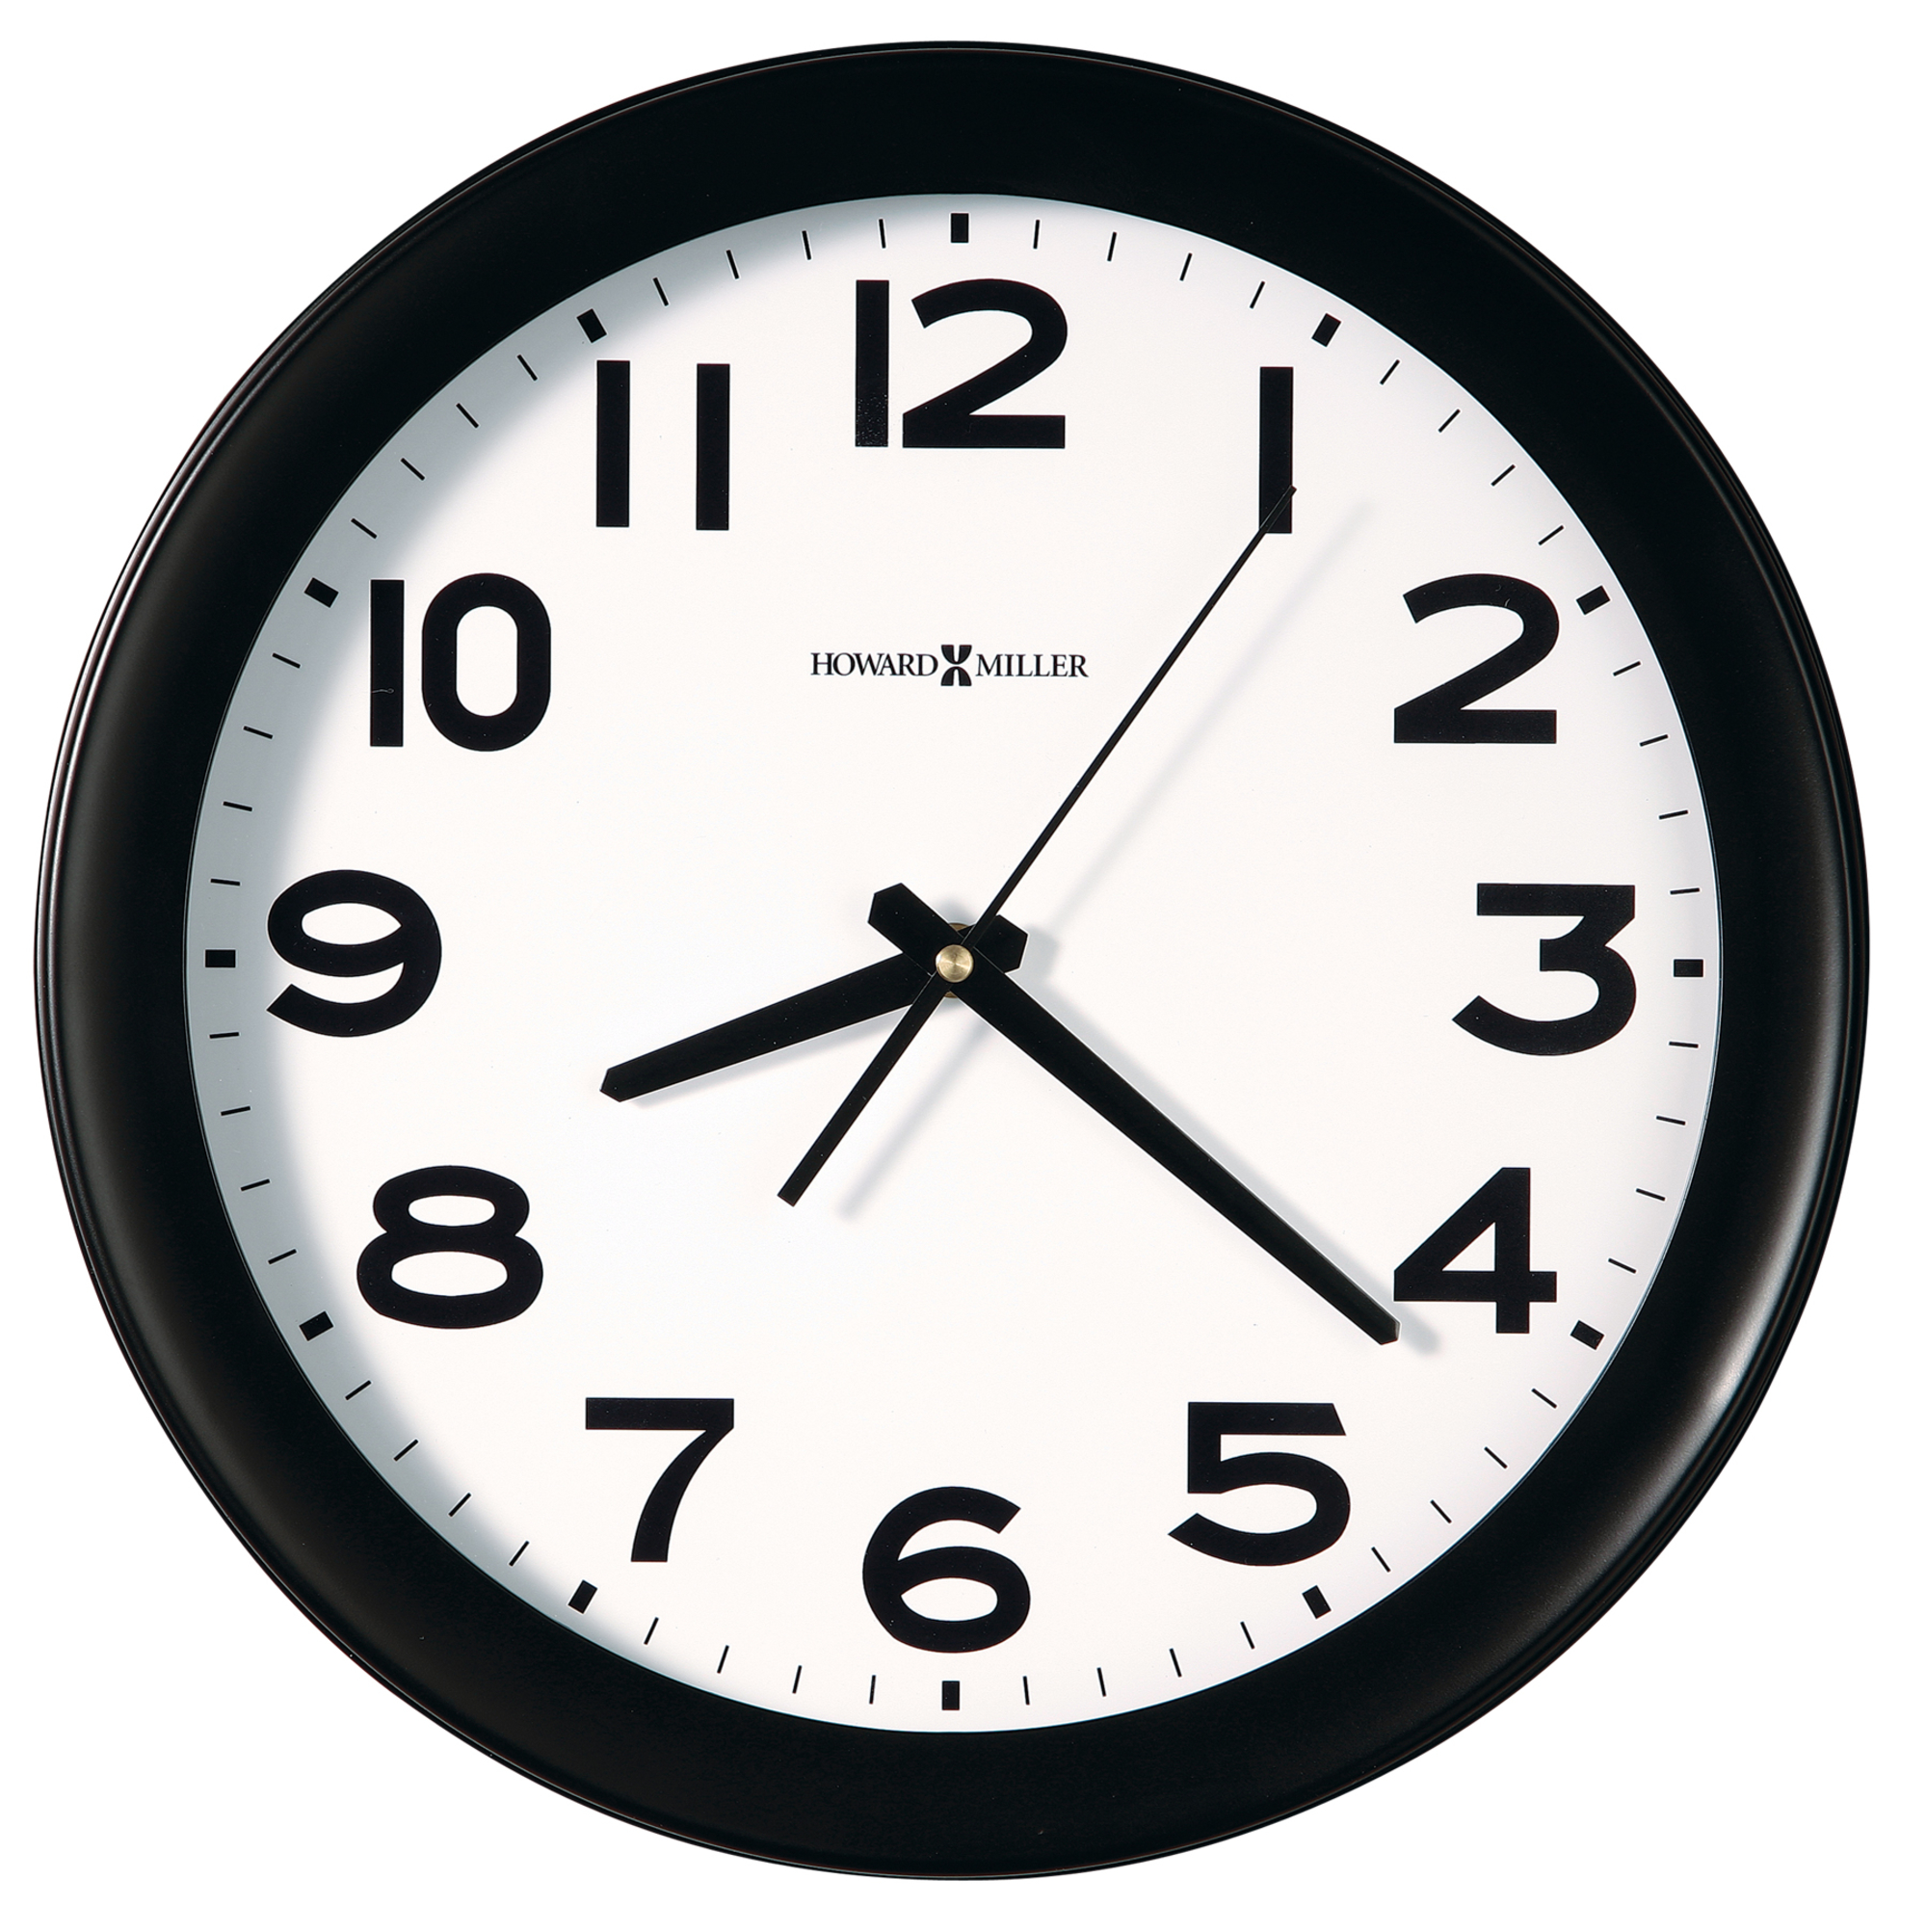 Howard miller wall clocks at 1 800 4clocks howard miller kenwick wall clock amipublicfo Gallery